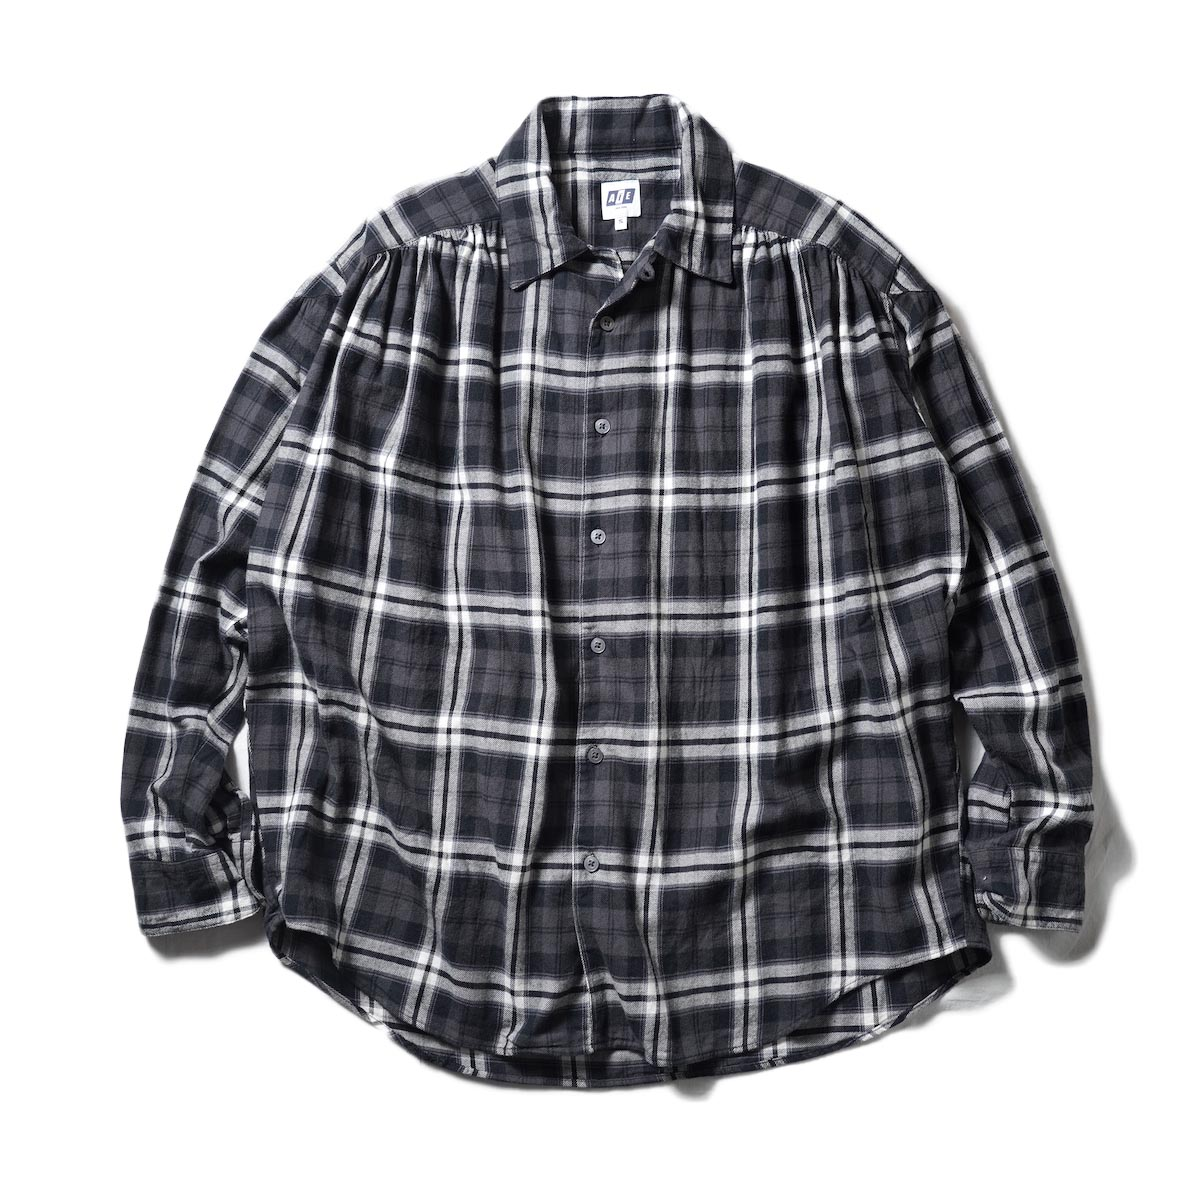 AiE / Painter Shirt-Cotton Big Brushed Twill Plaid (Black)